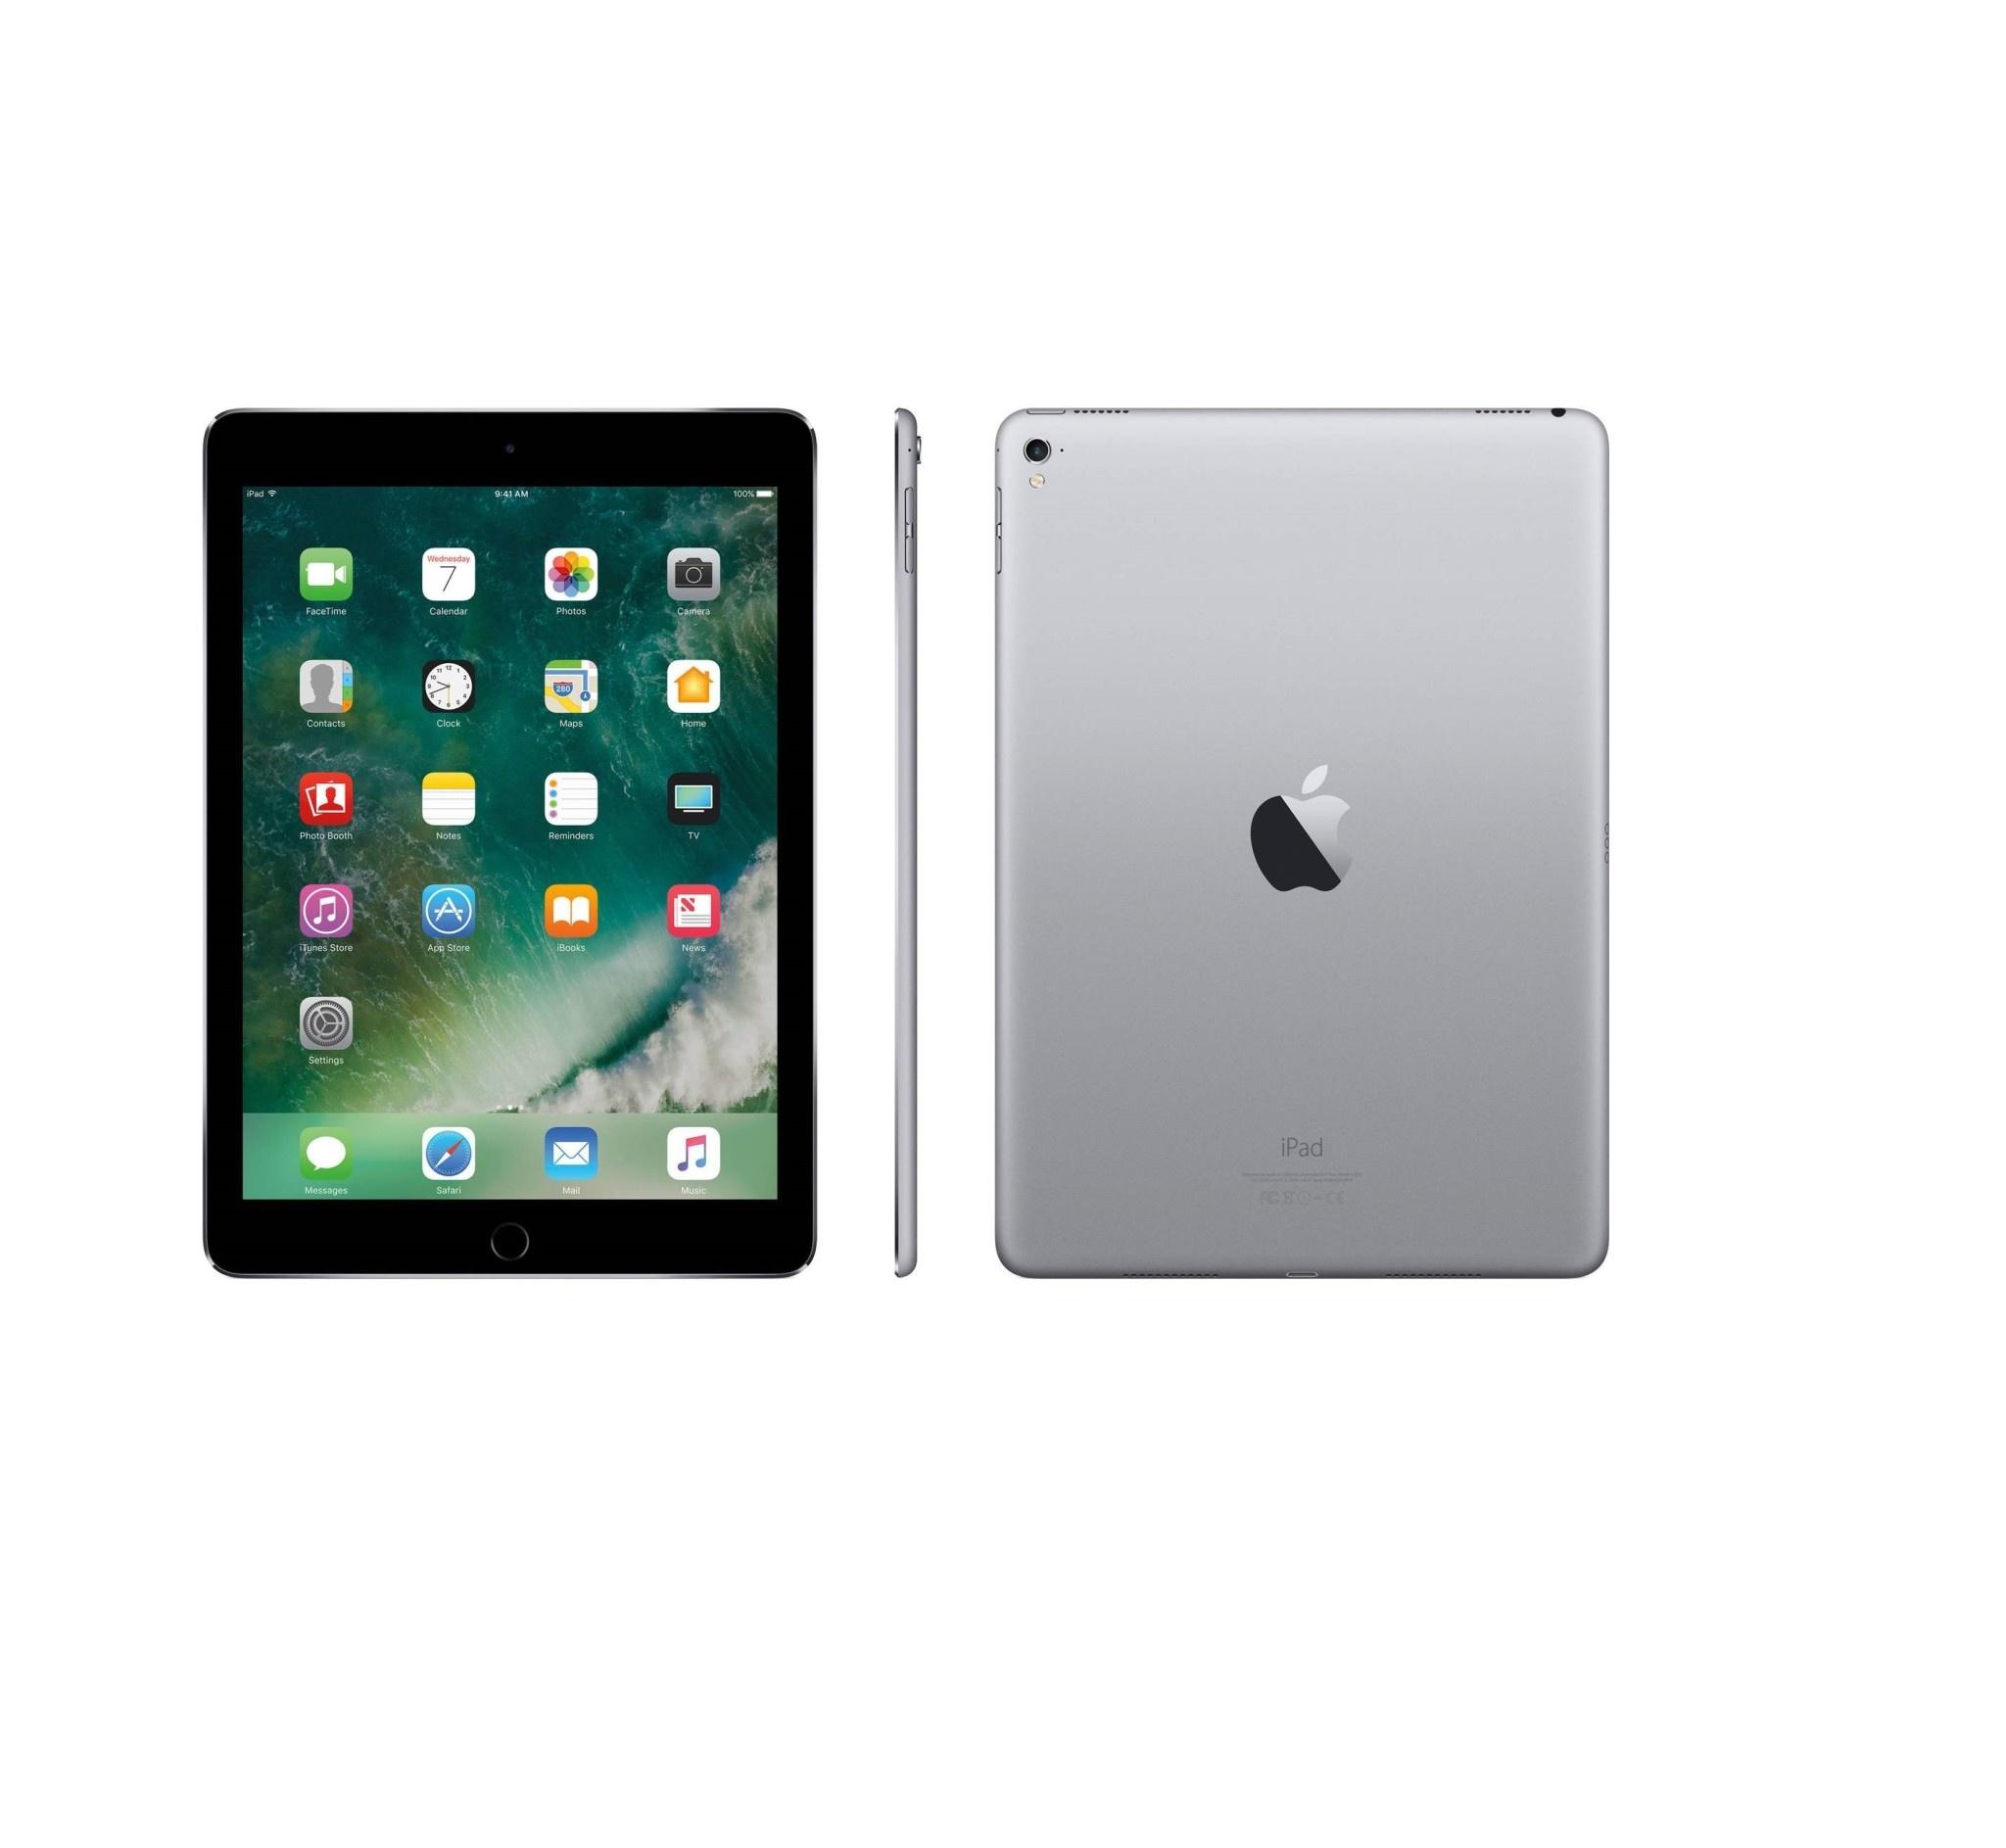 Apple iPad 2018 A1893 9.7 inch 128Gb Refurbished Tablet